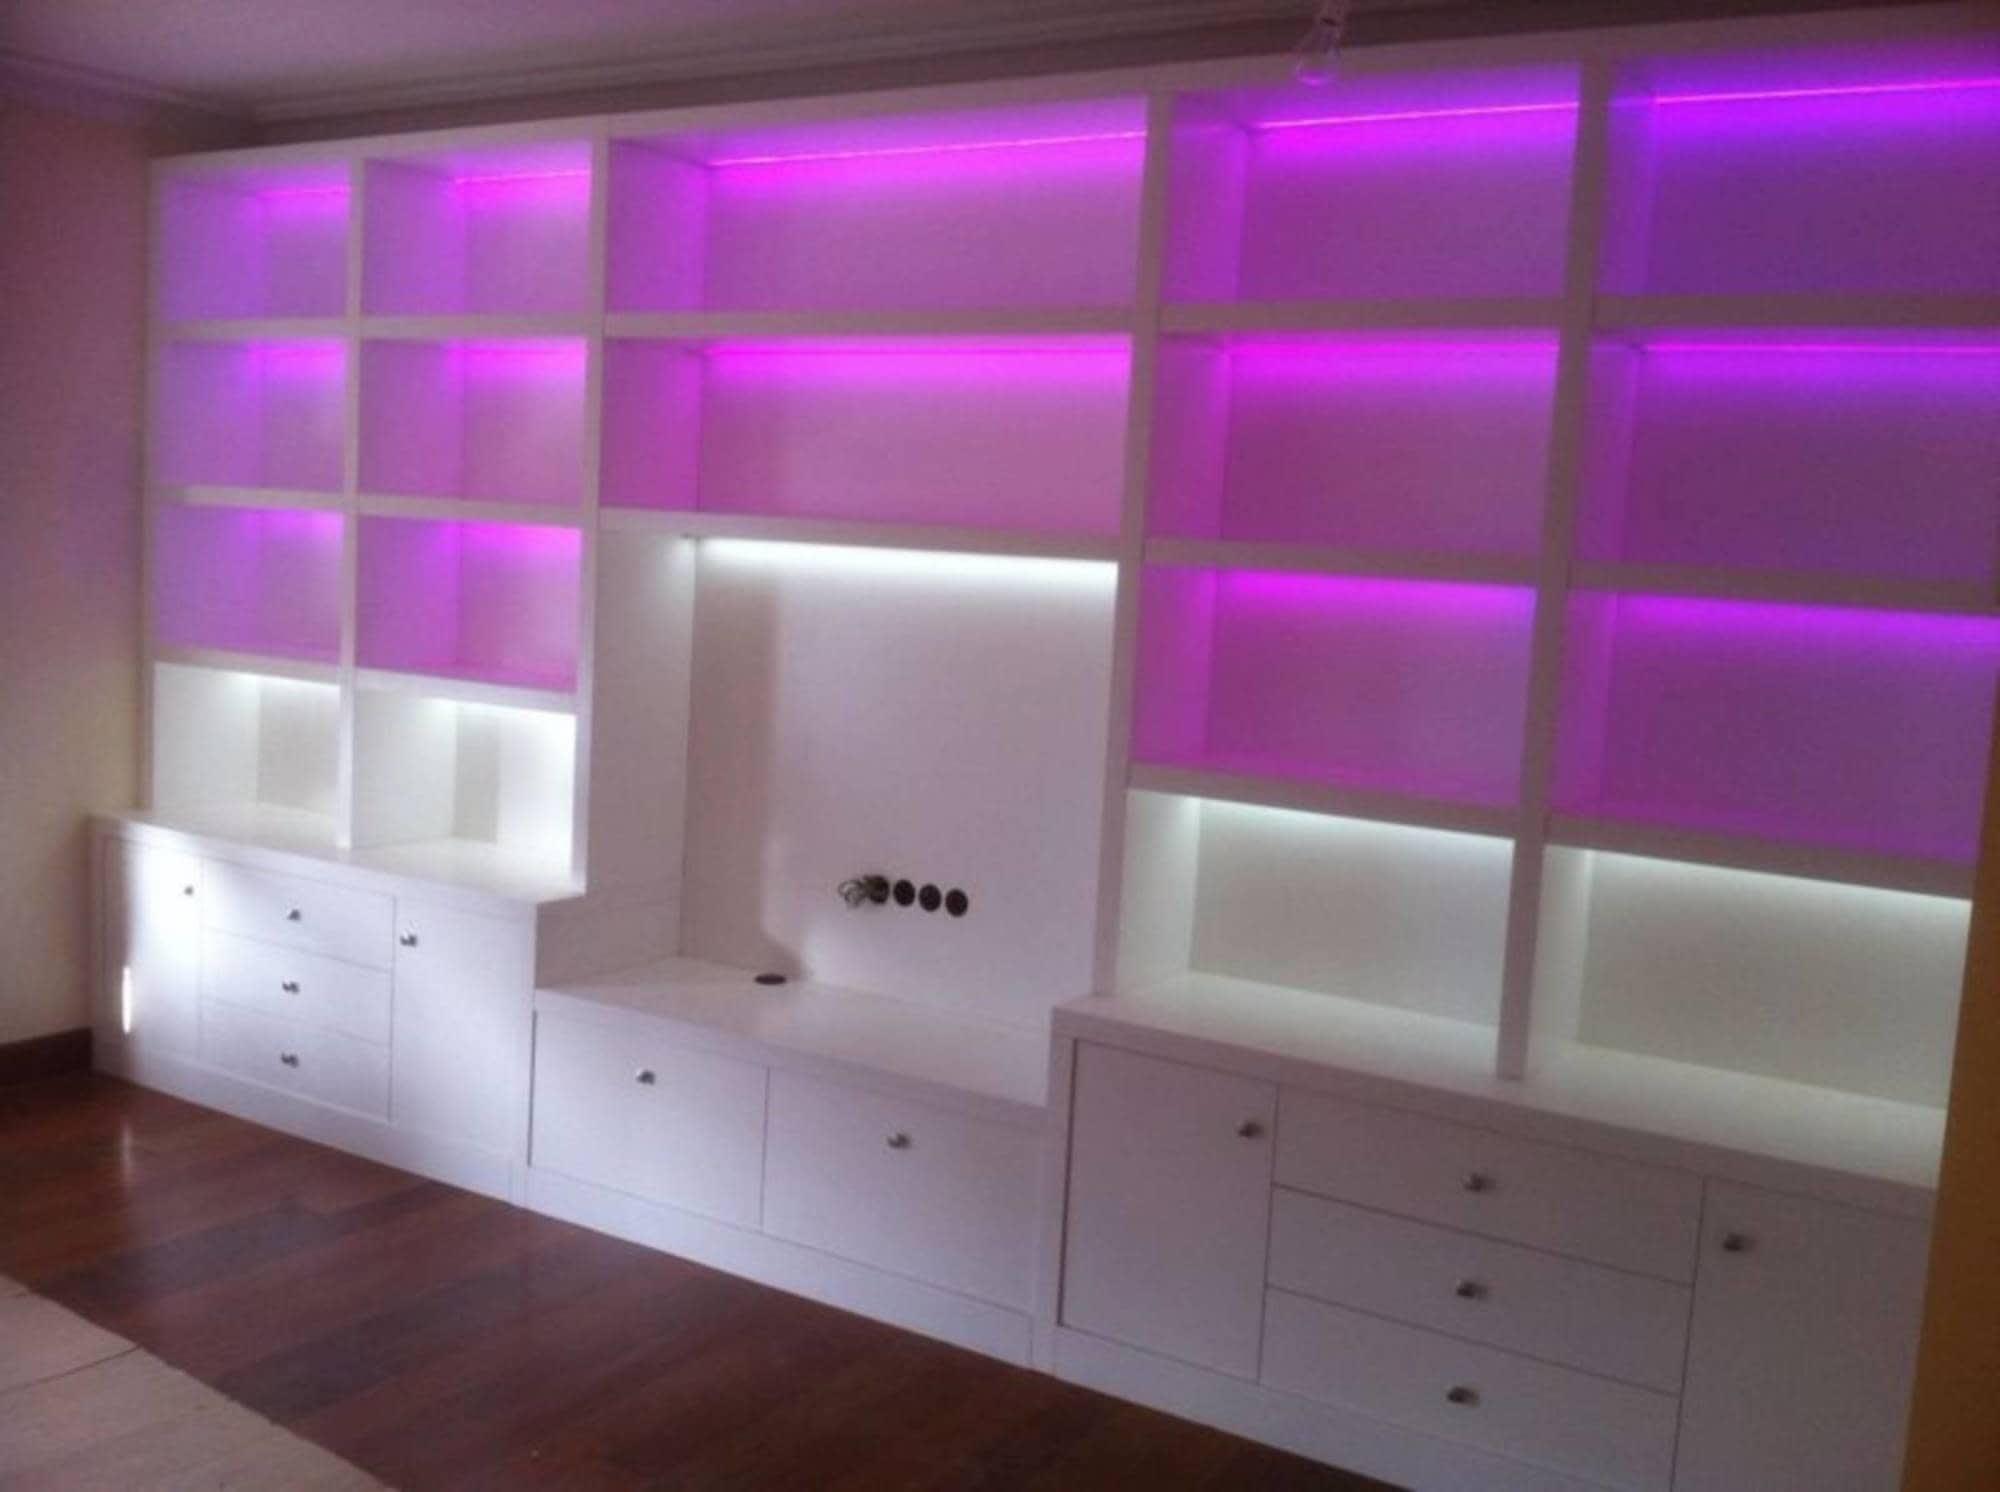 Muebles A Medida Bilbao Trendy Suelo With Muebles A Medida Bilbao  # Muebles Becerra